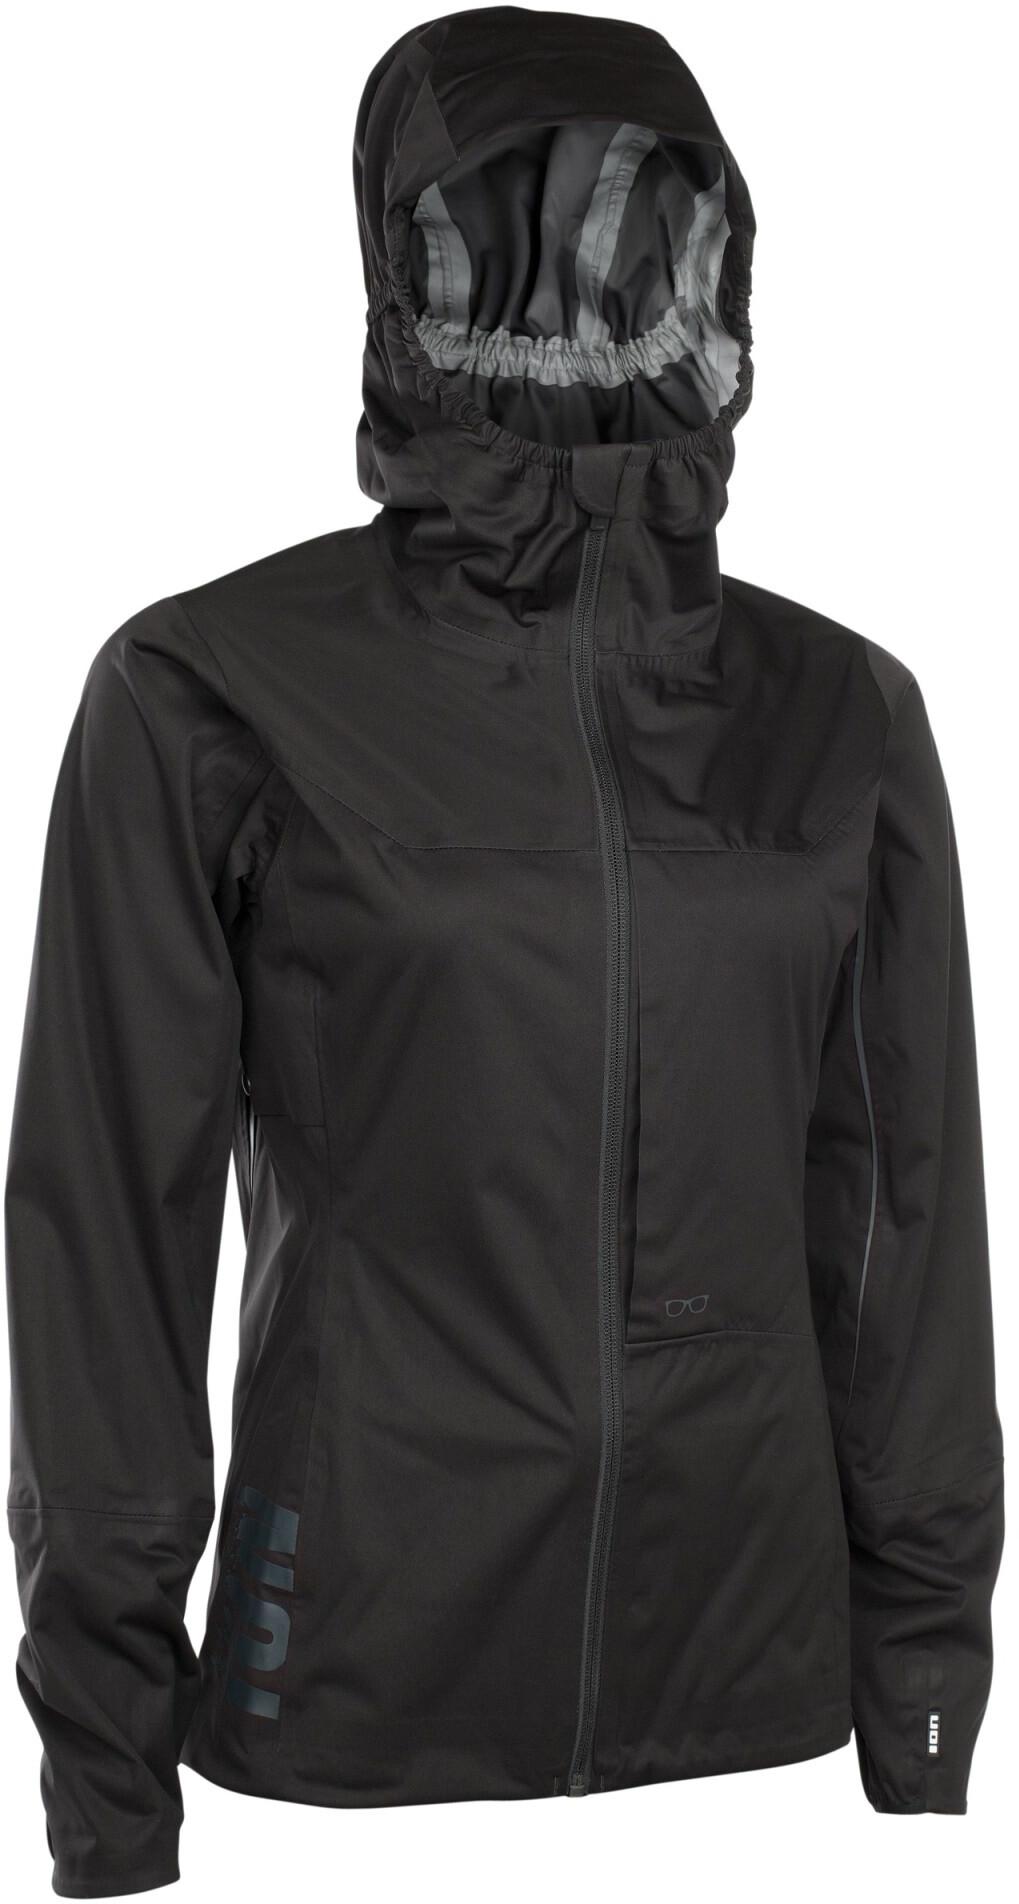 ION Windjacke Windbreaker Jacket